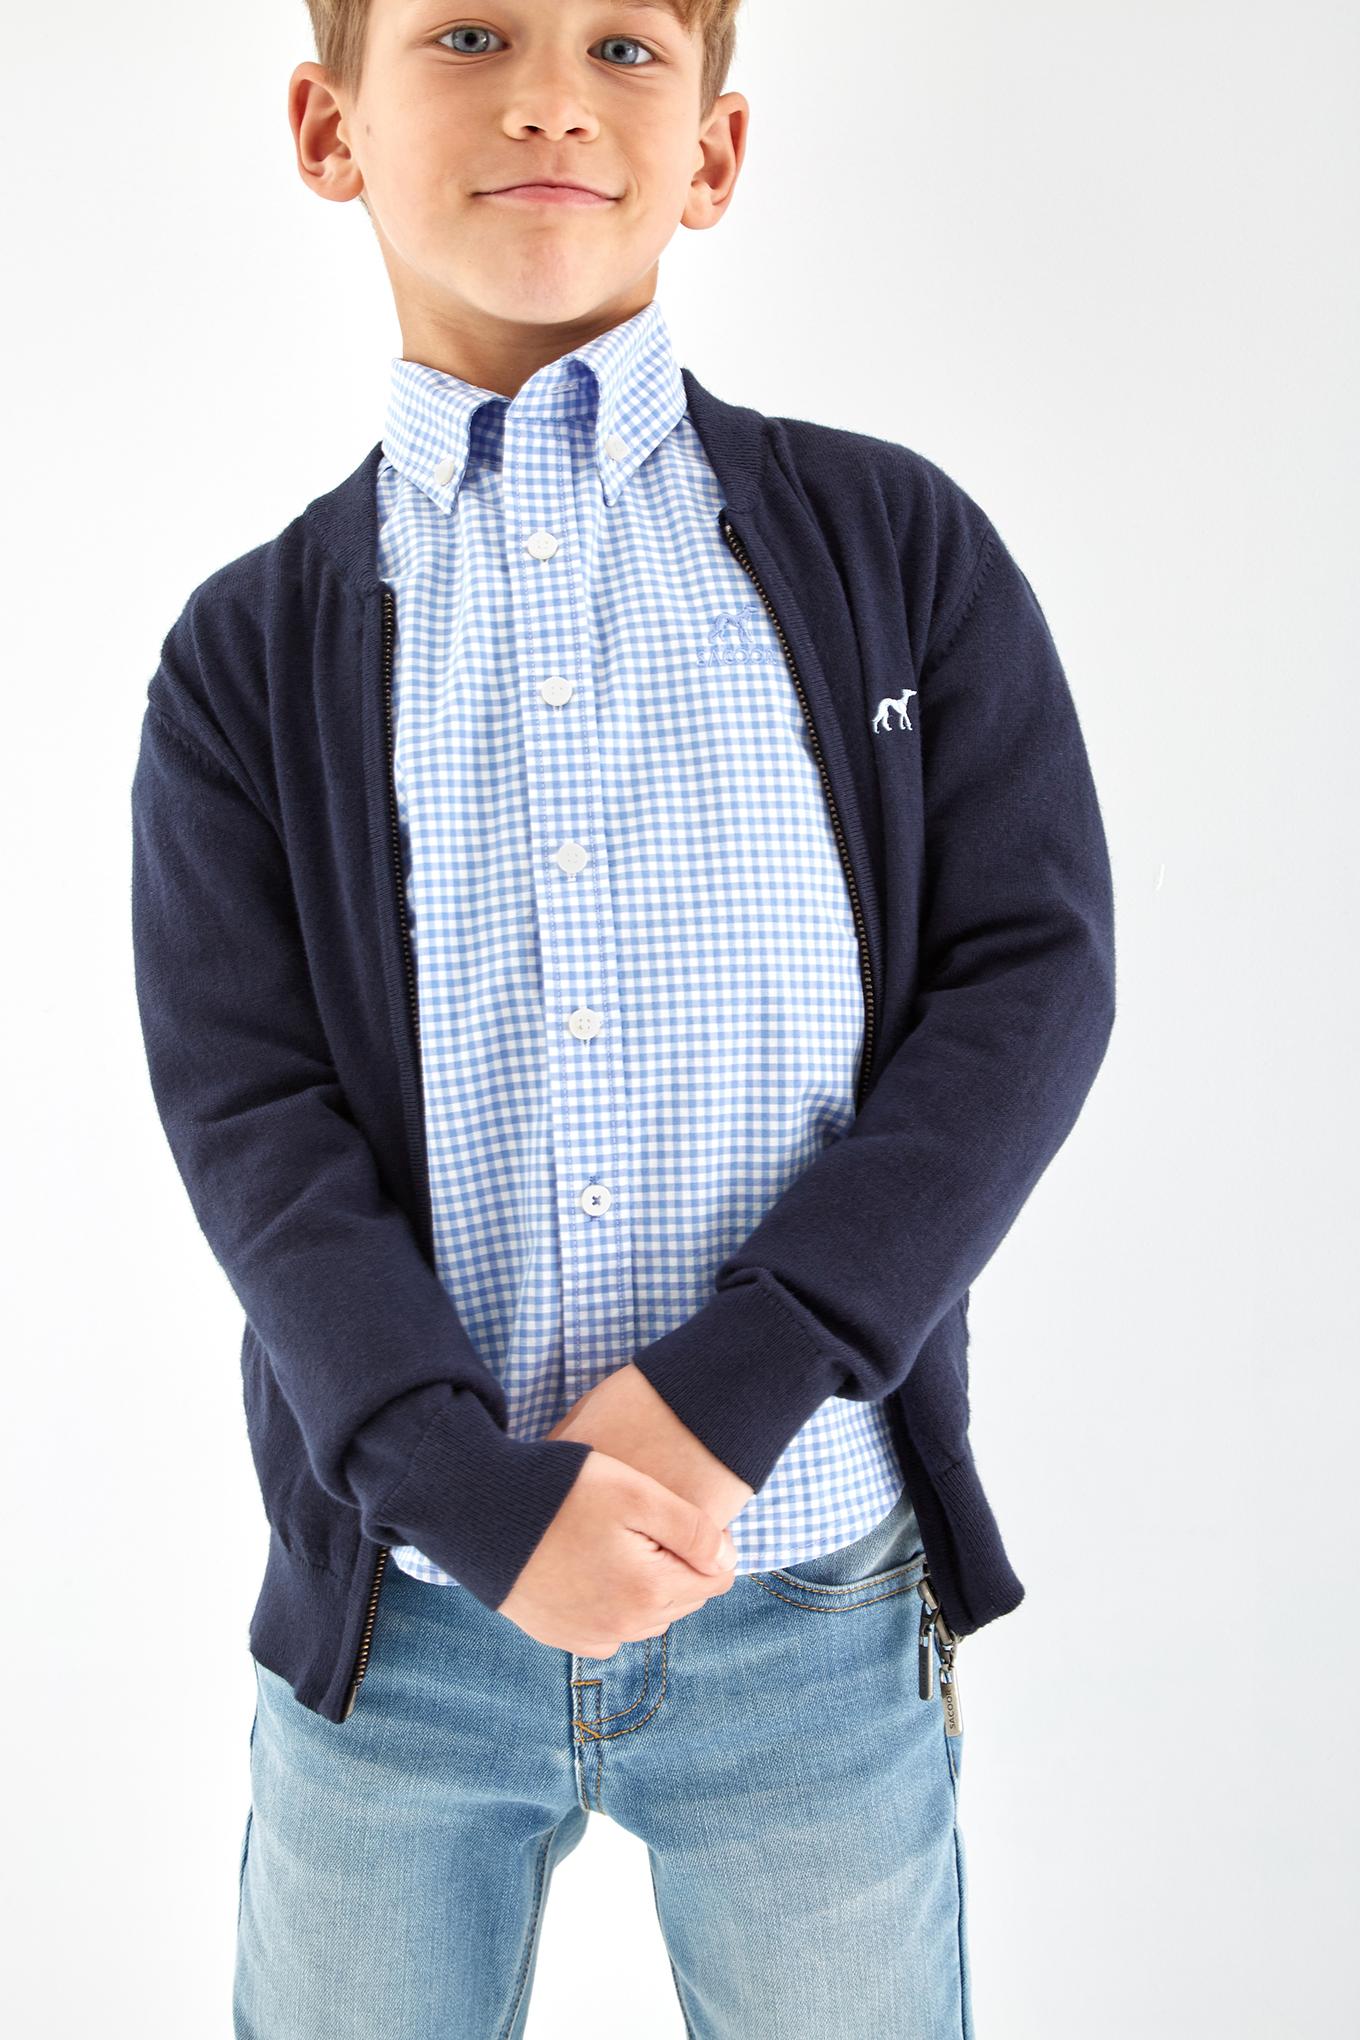 Cardigan Azul Escuro Sport Rapaz